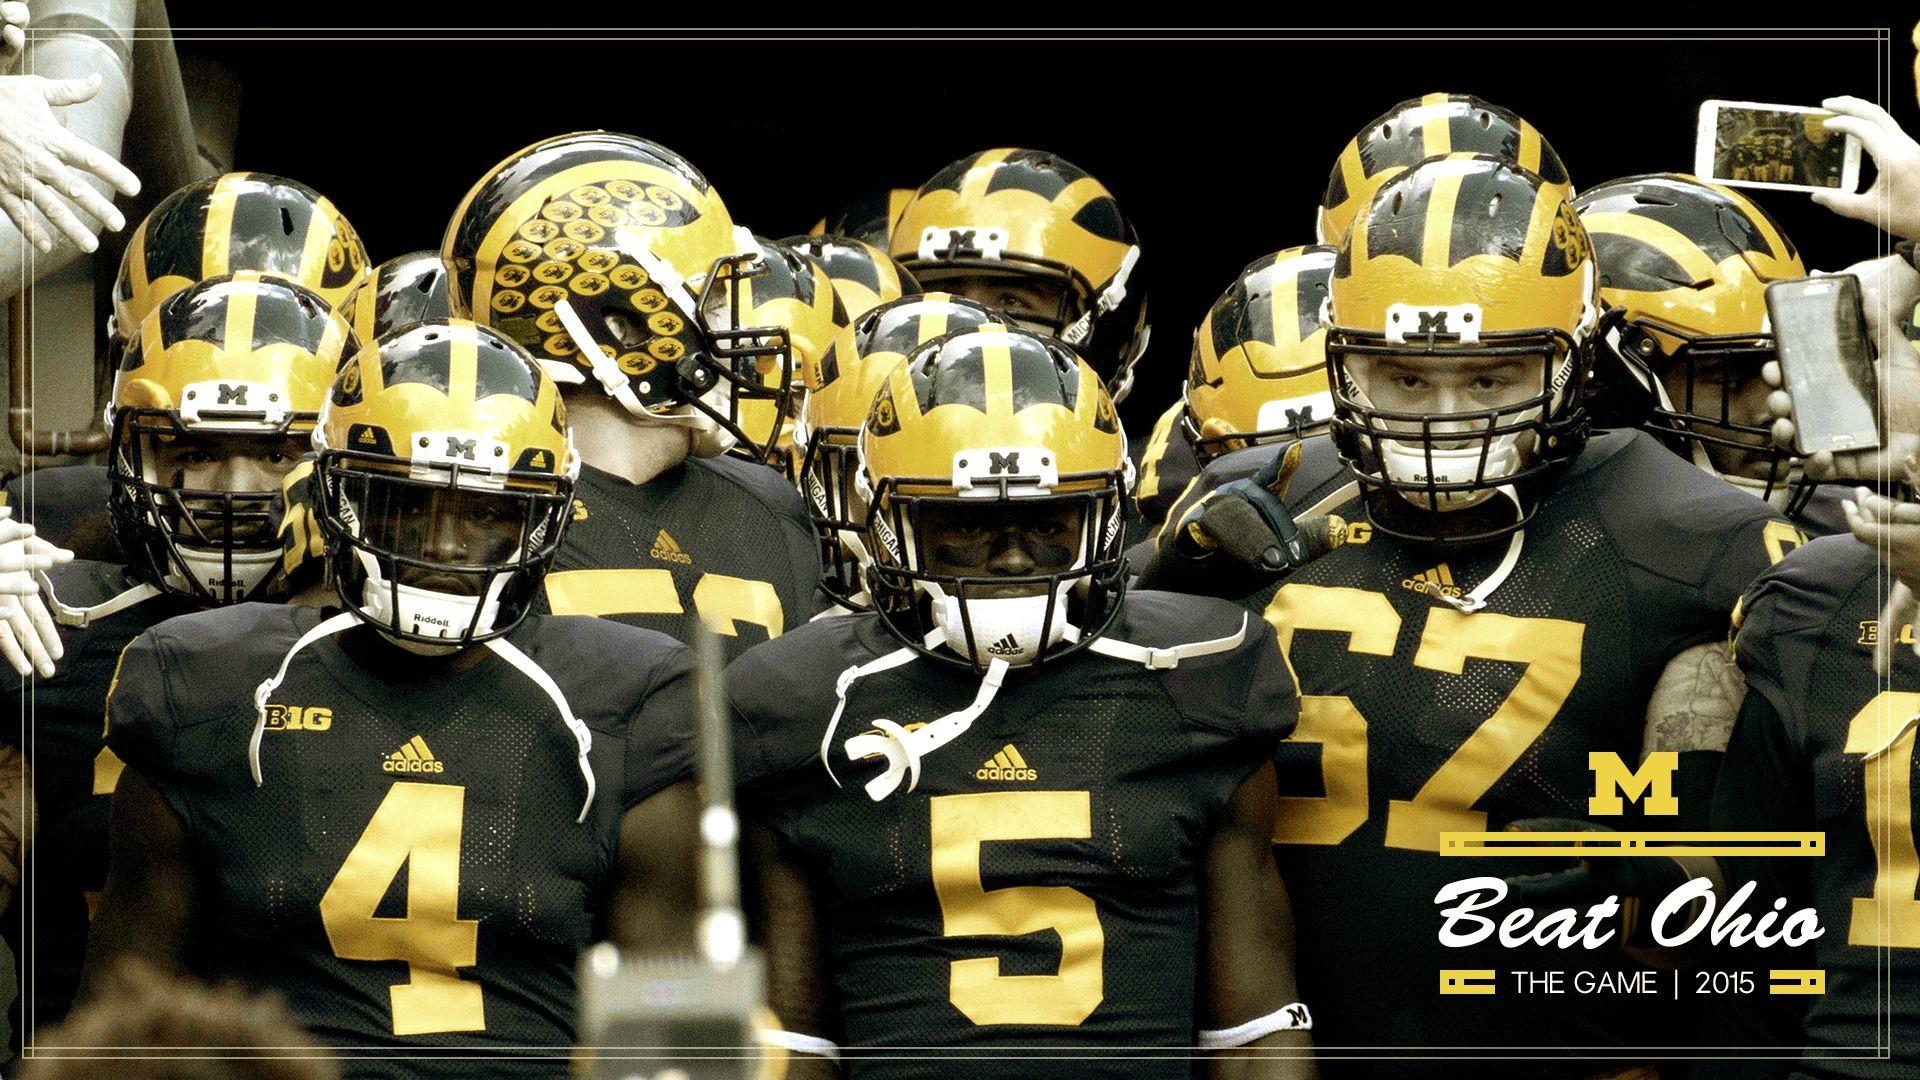 NCAA Football Demo Ohio State Buckeyes vs Michigan 1920×1080 Michigan  Wolverines Football Wallpapers (